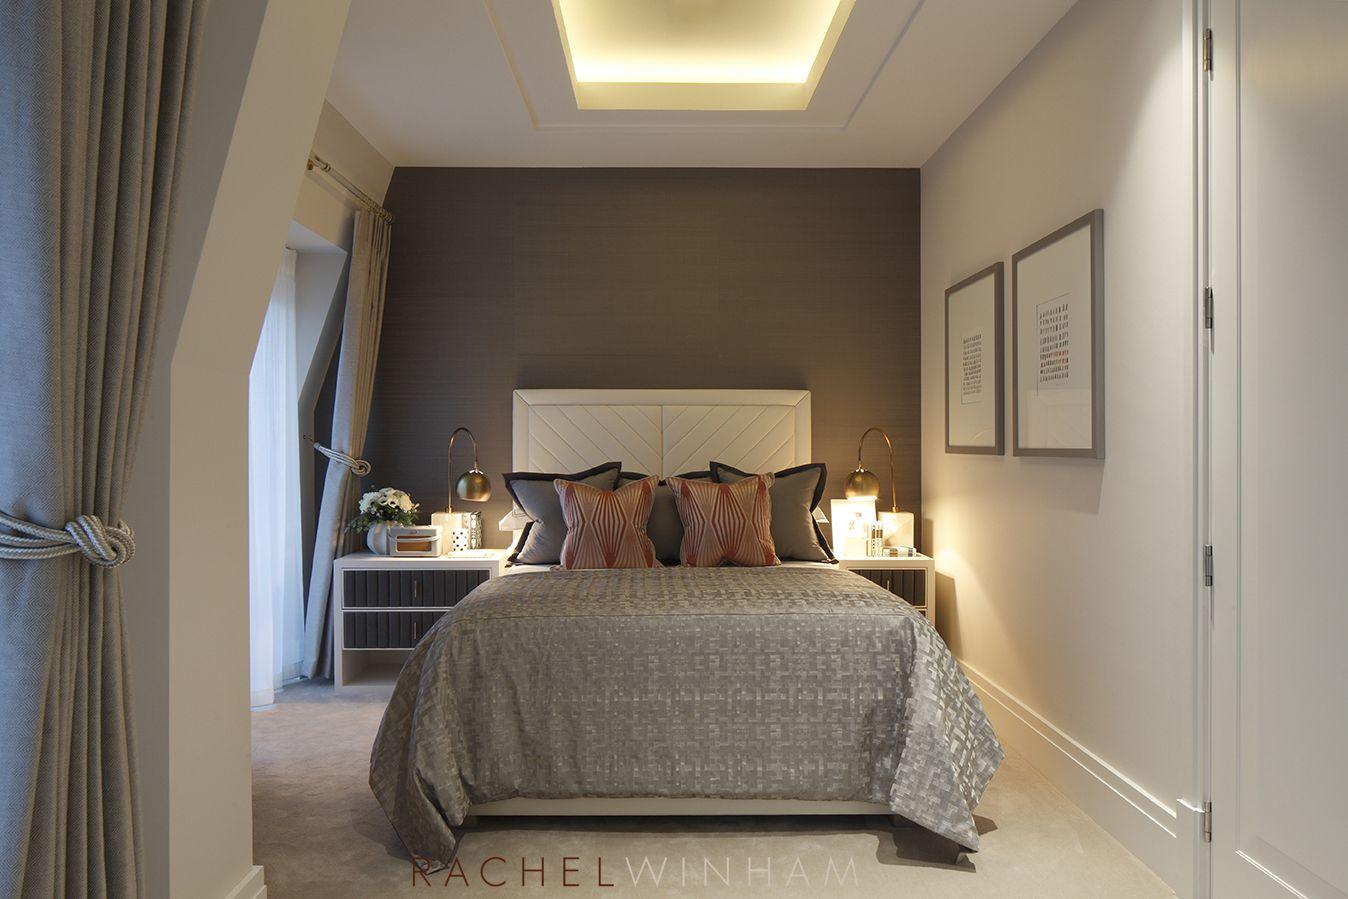 Interior Designed Bedrooms Impressive Bedroom Designedrachel Winham Interior Design For A Recent Design Inspiration